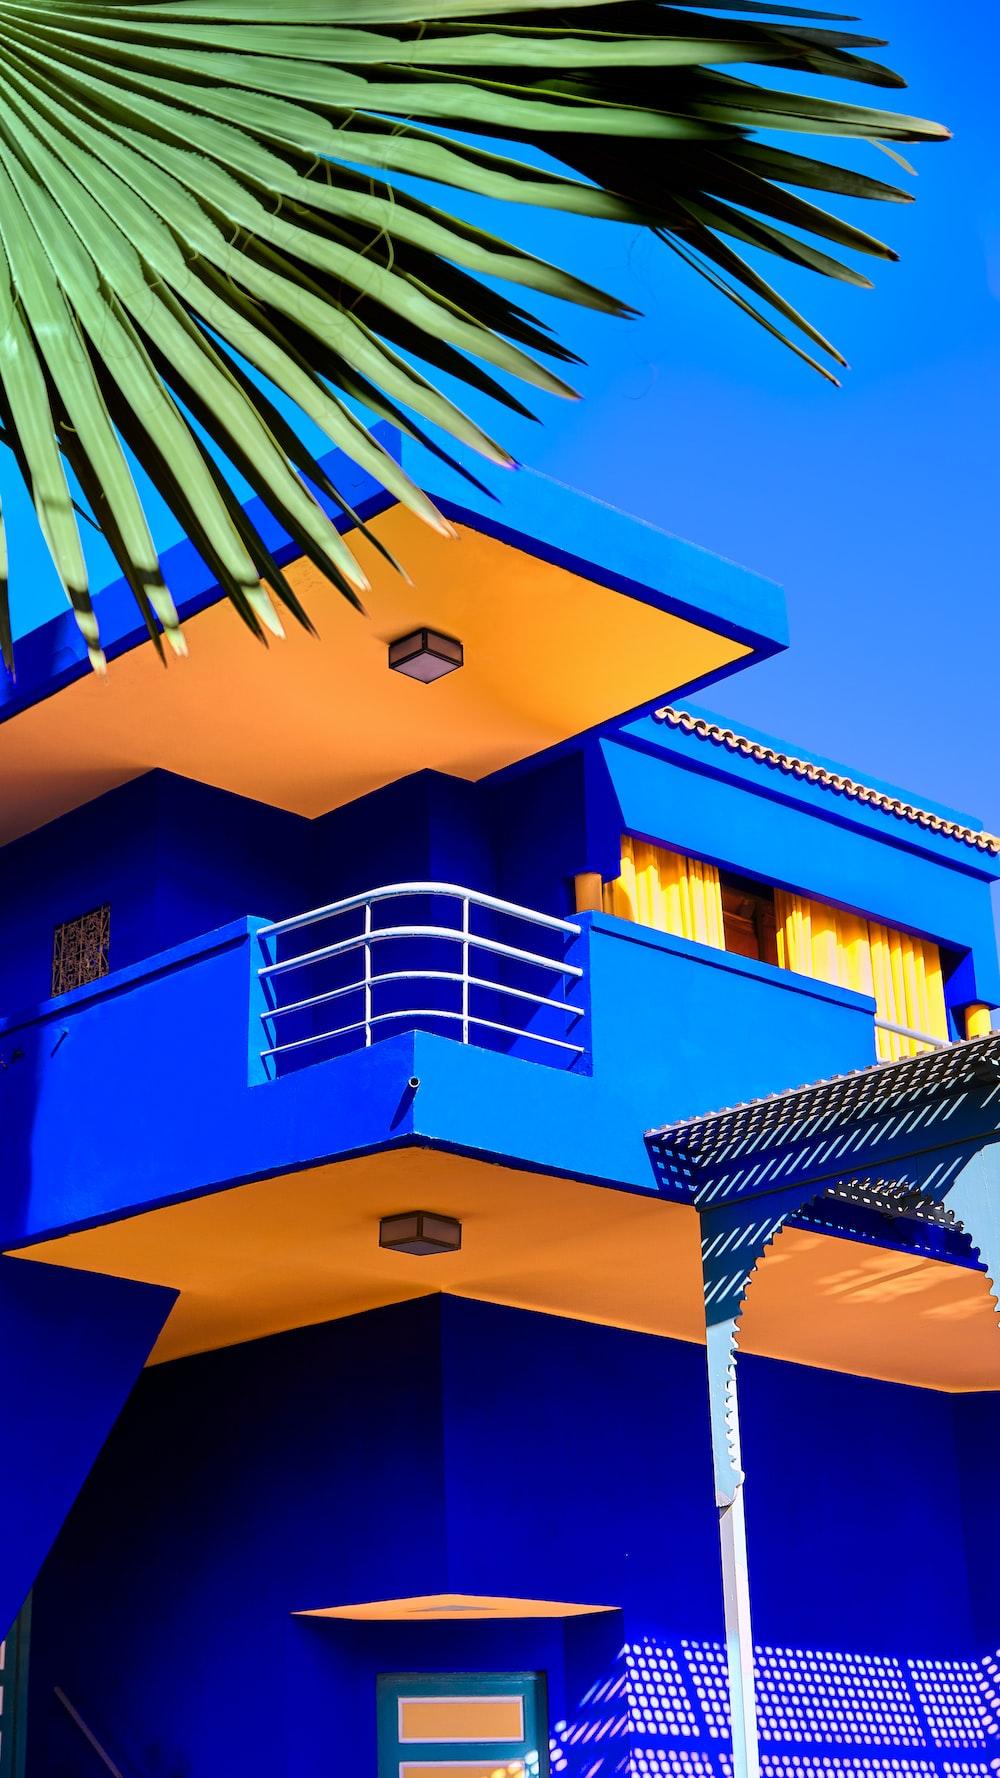 blue and orange building